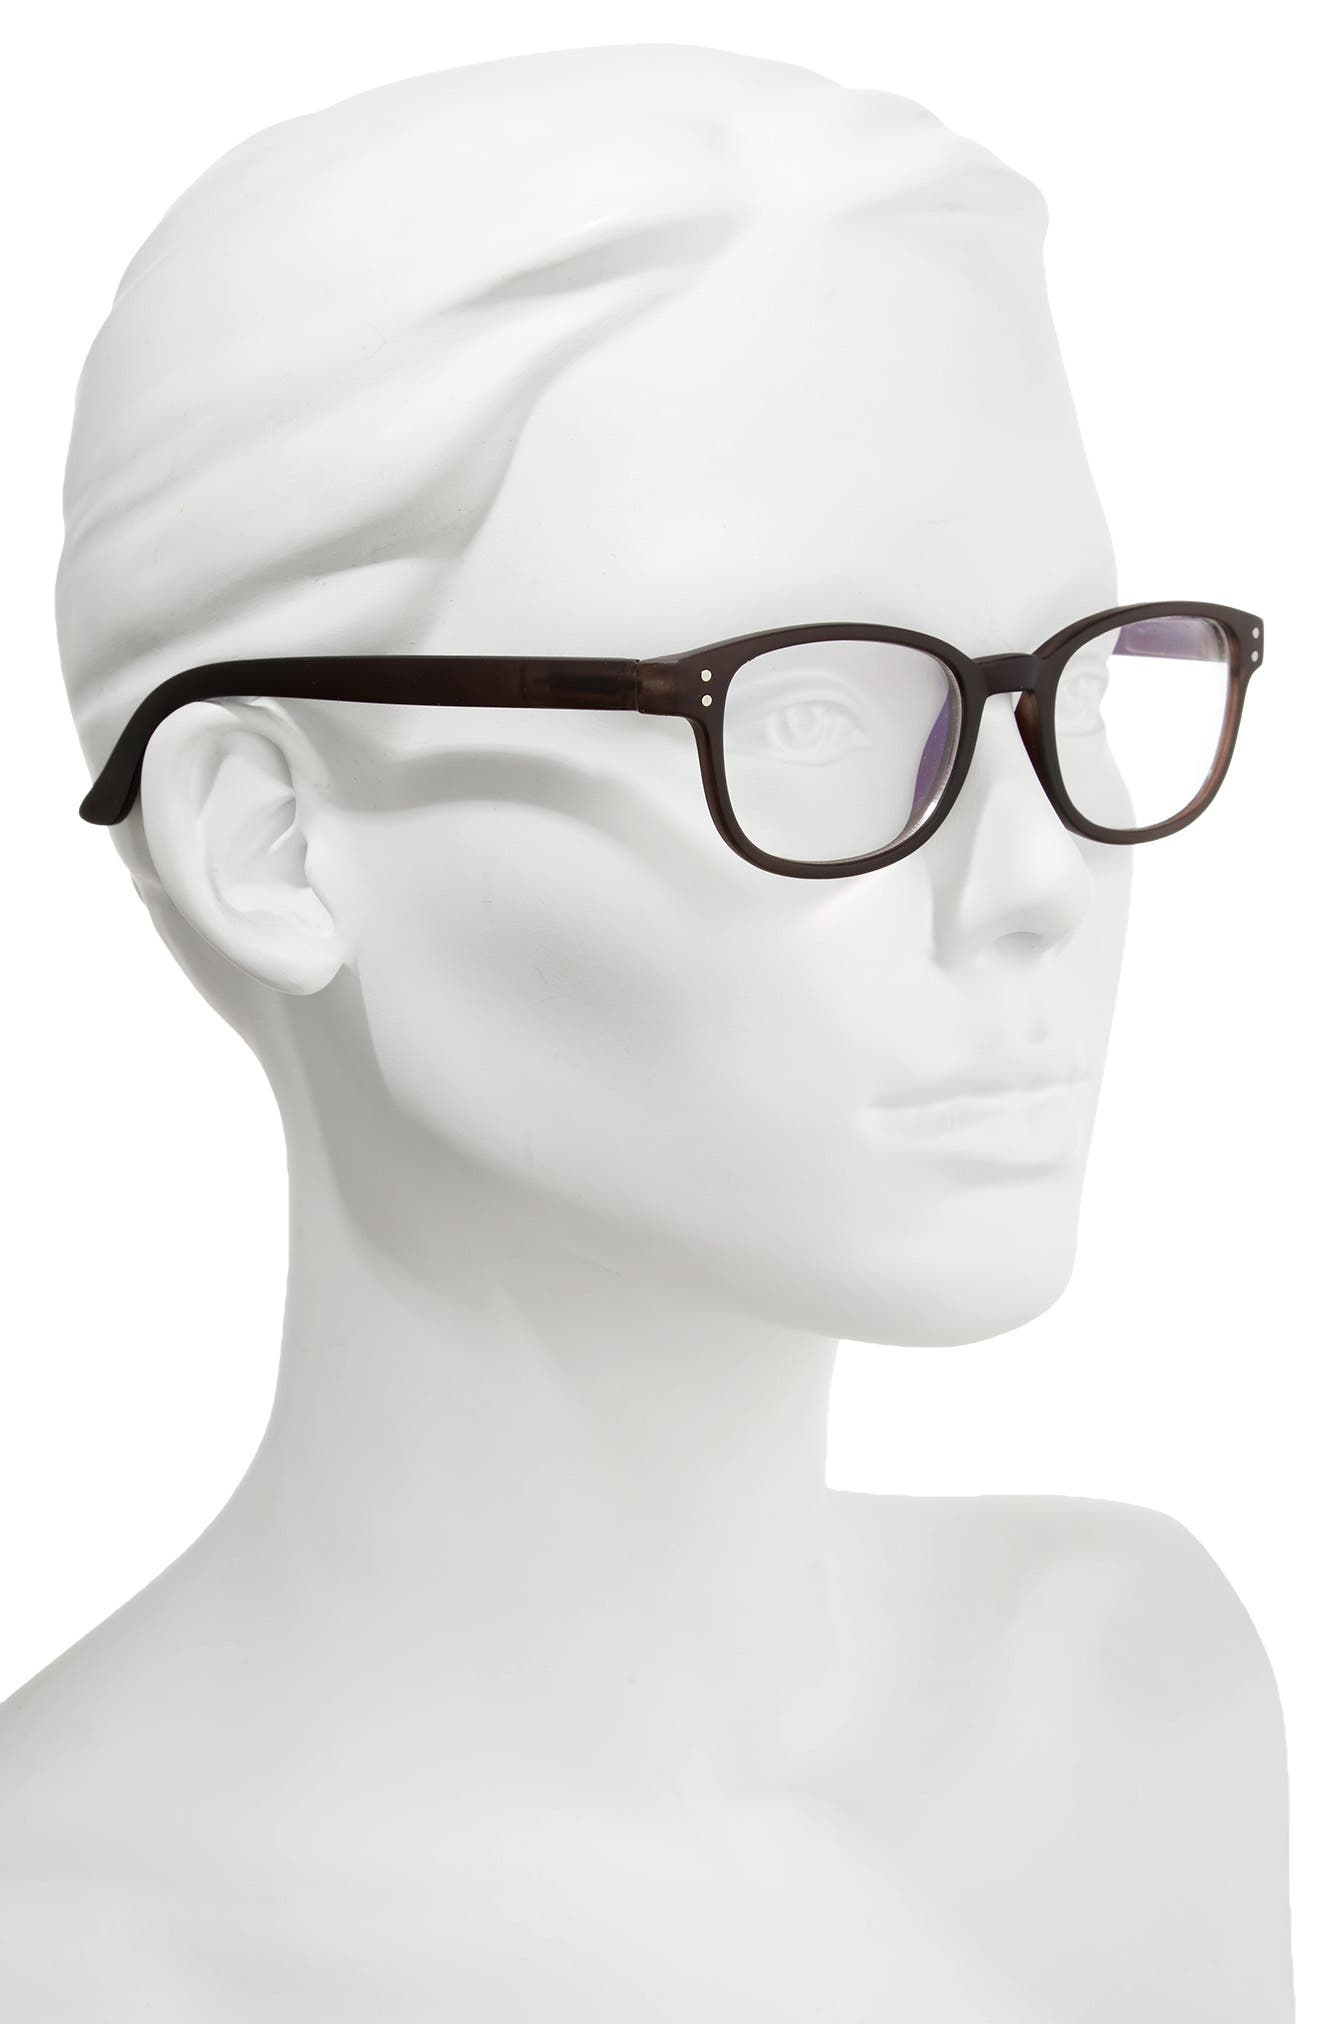 ColorSpex<sup>®</sup> 50mm Blue Light Blocking Reading Glasses,                             Alternate thumbnail 2, color,                             Black